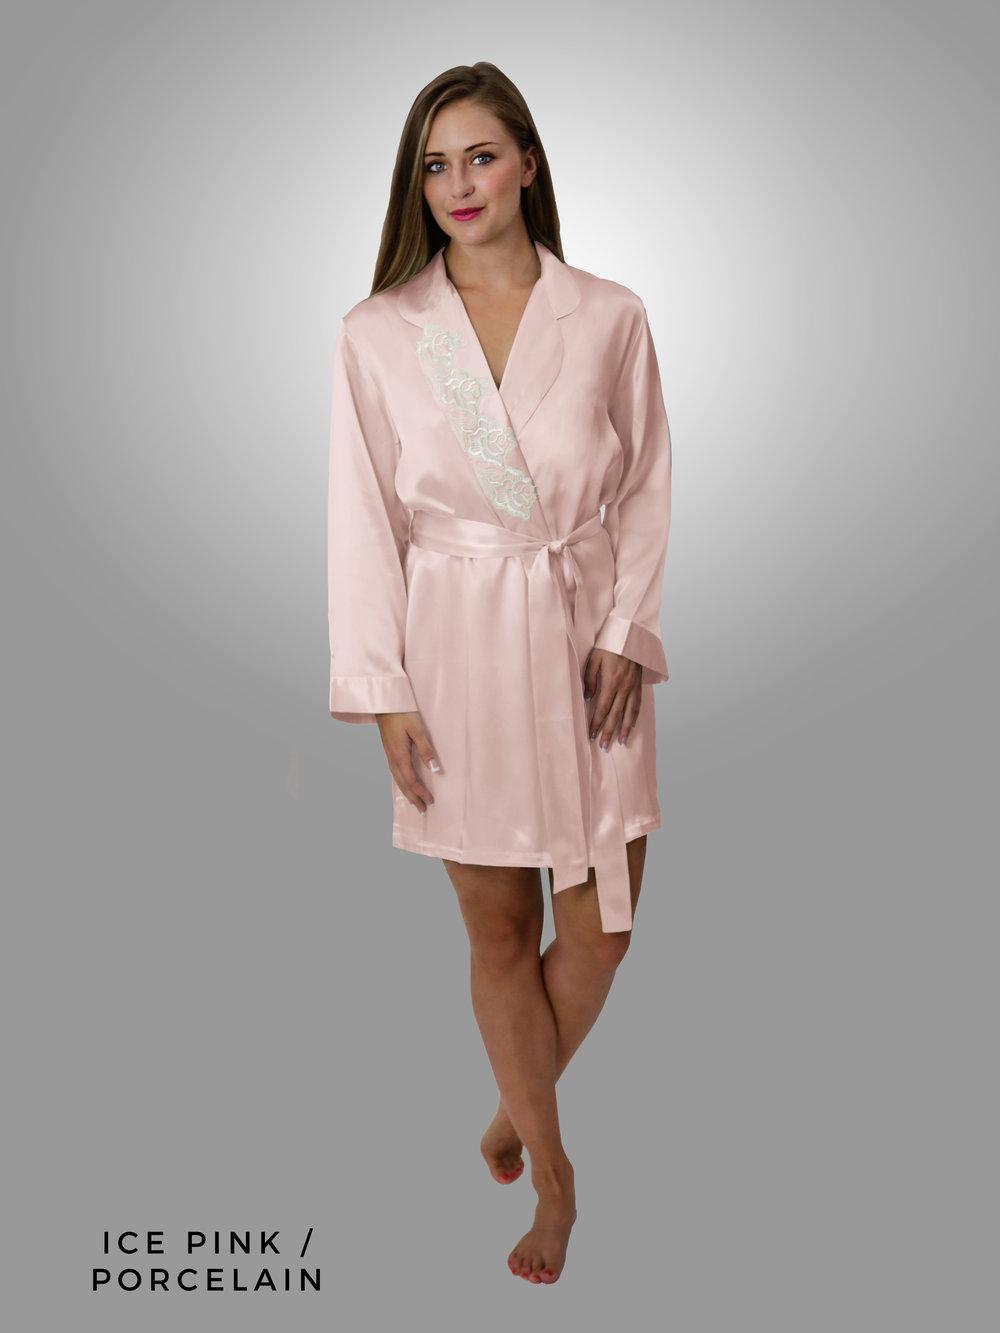 fdceeb143b7 DESIREE Short Robe — Linda Hartman Intimates